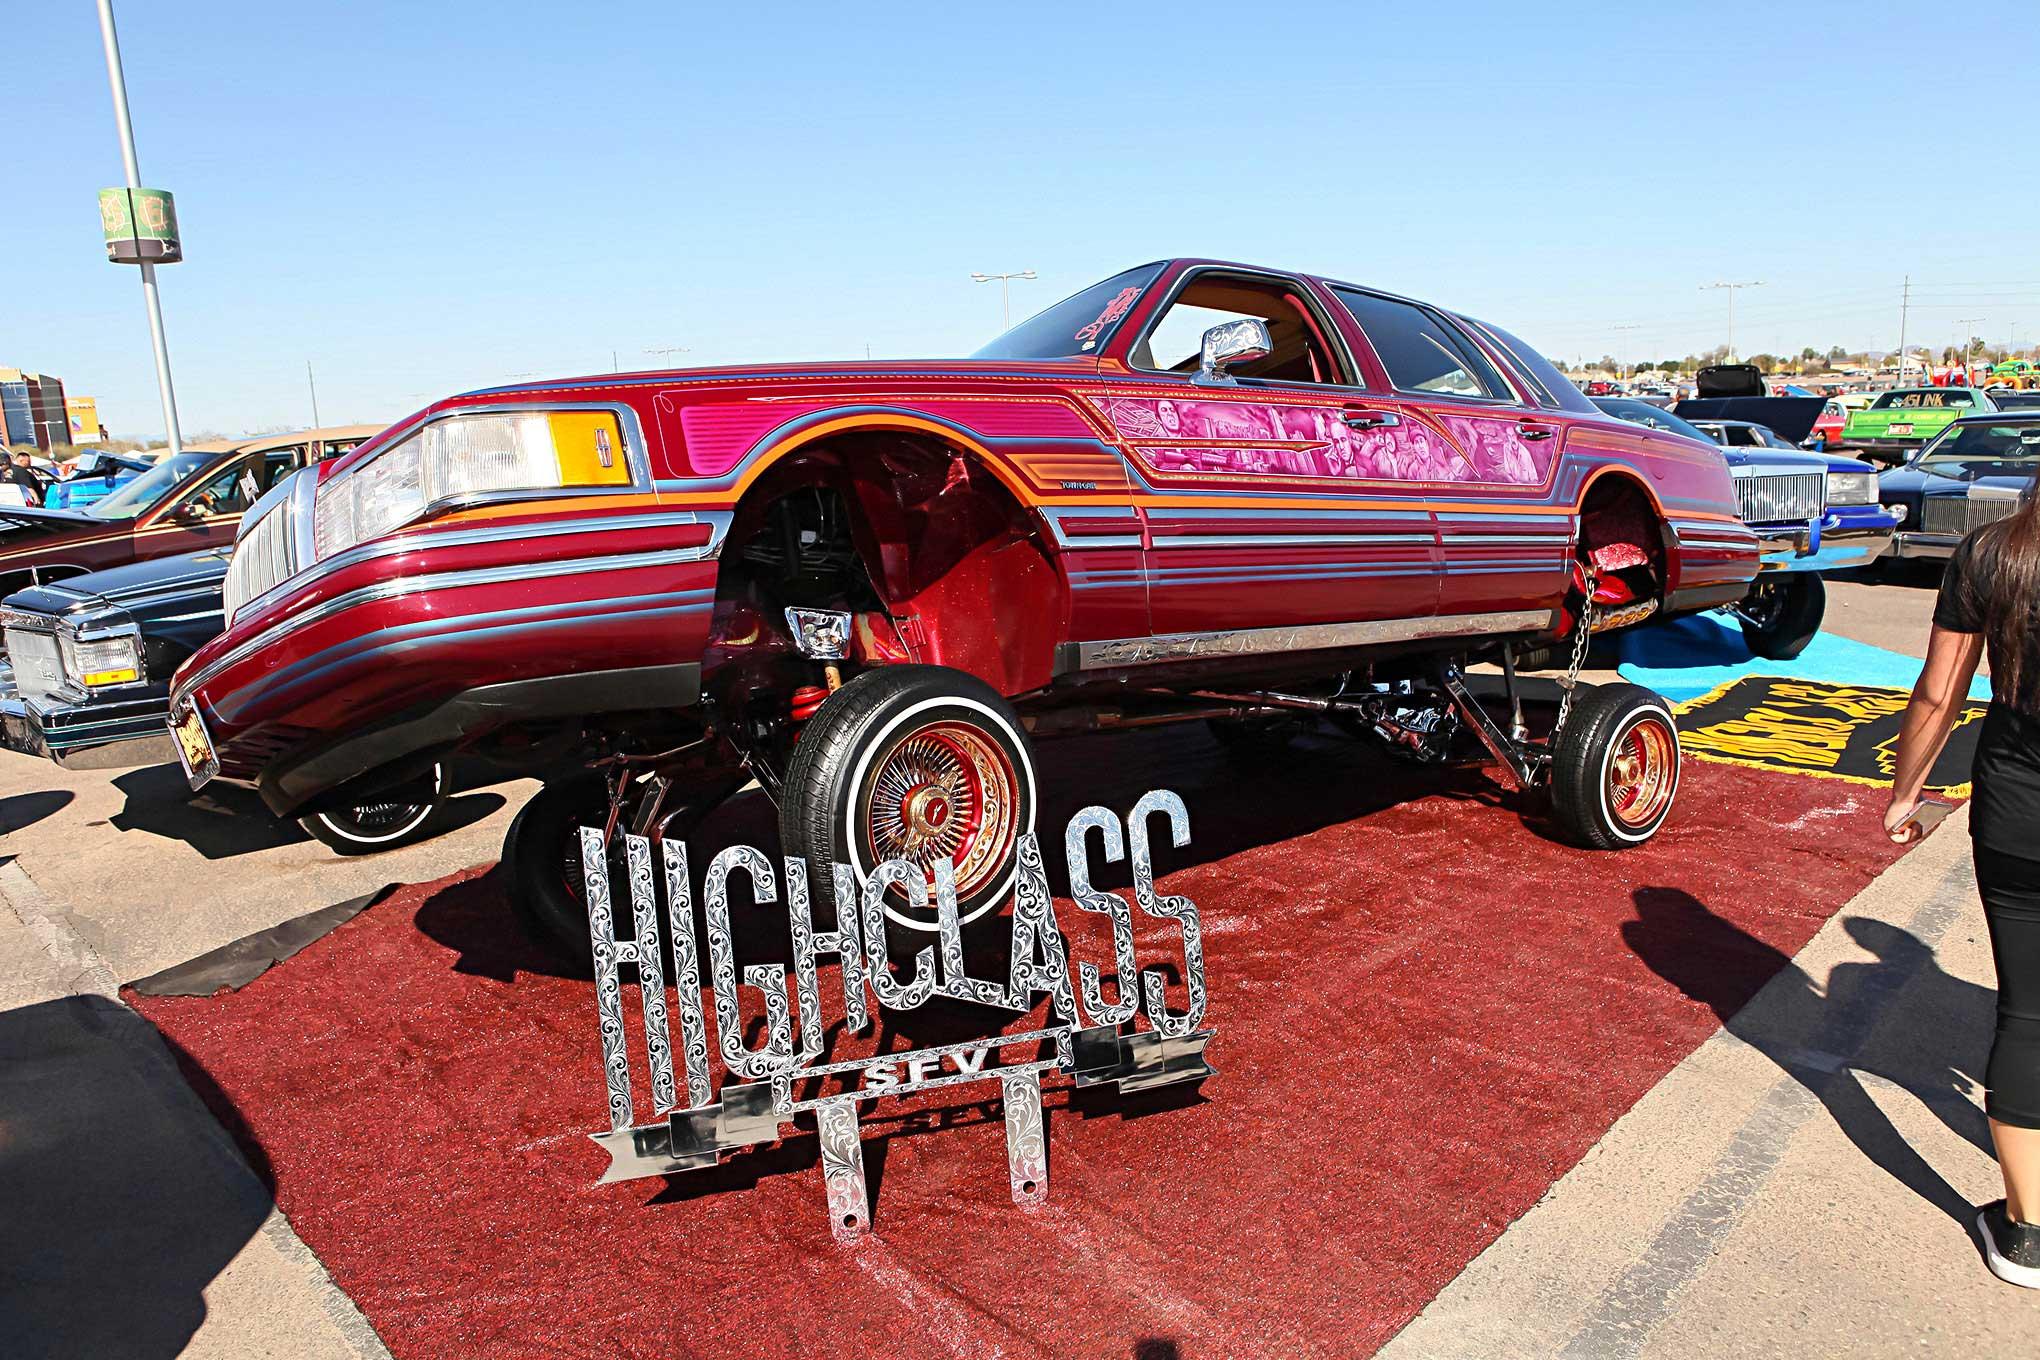 2018 Arizona Super Show Highclass Cc Lincoln Town Car Lowrider